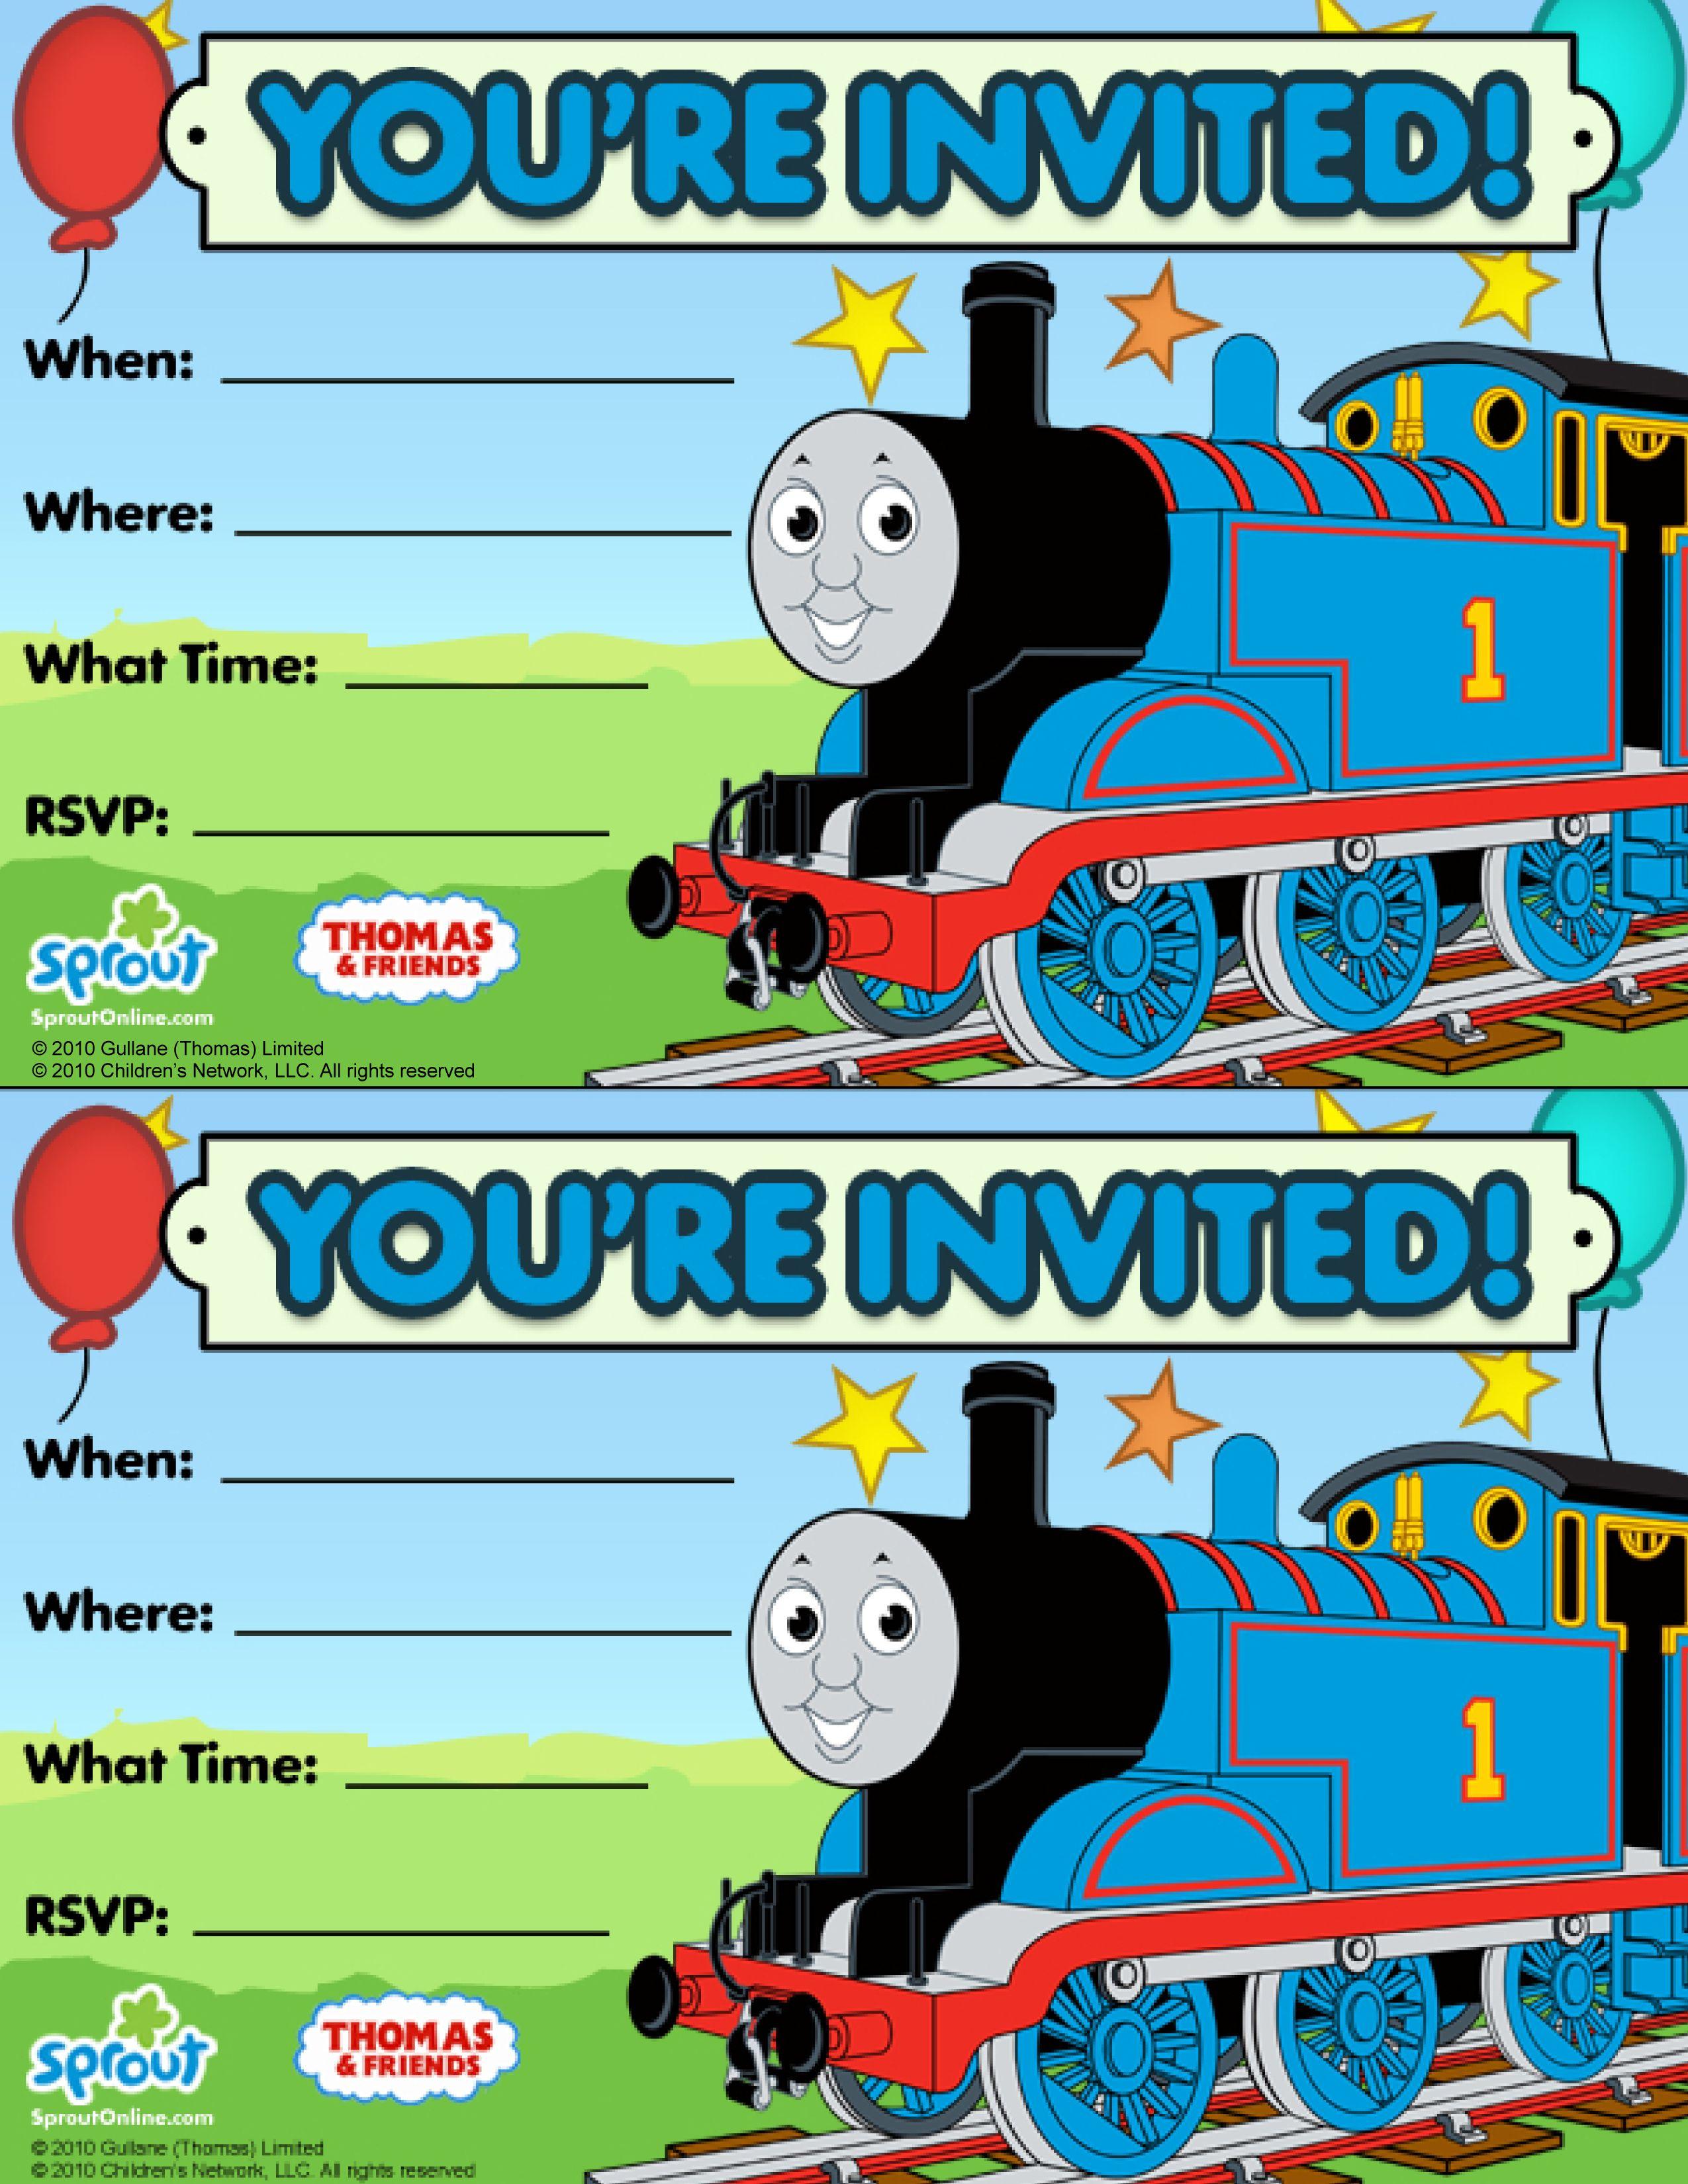 Thomas & Friends Party Invitation: Free | Birthday Party Ideas - Thomas Invitations Printable Free